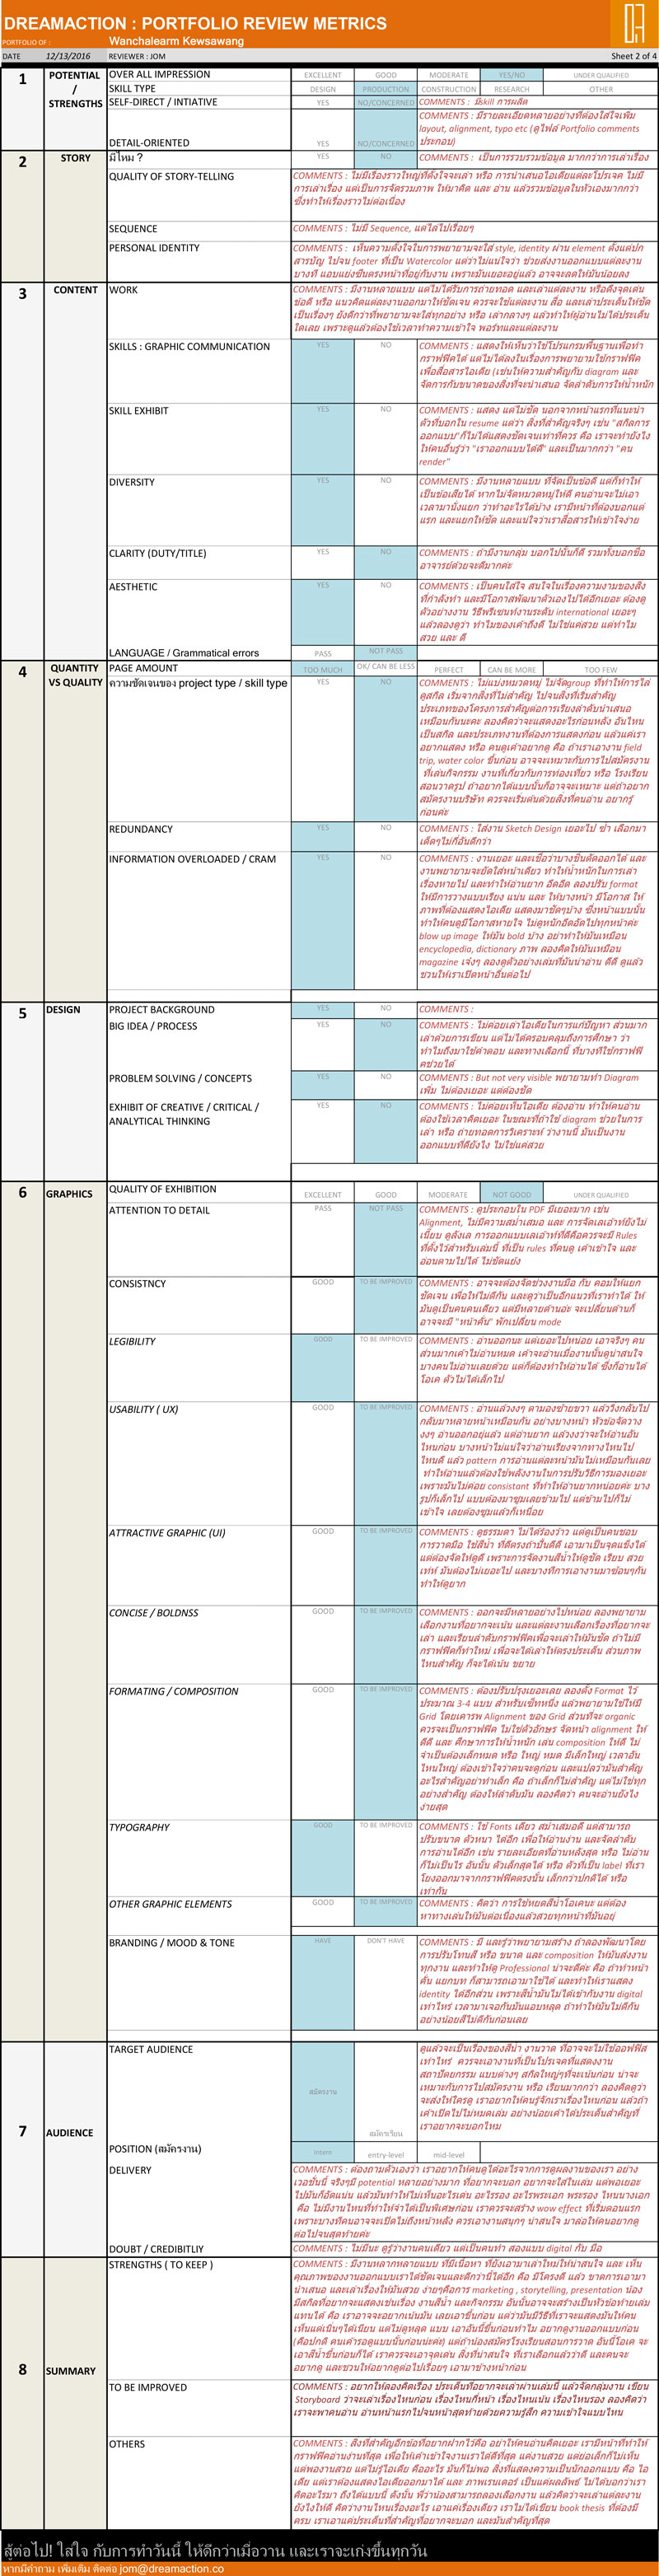 1 month 1 portfolio review รีวิว พอร์ทฟอลิโอ สถาปัตย์